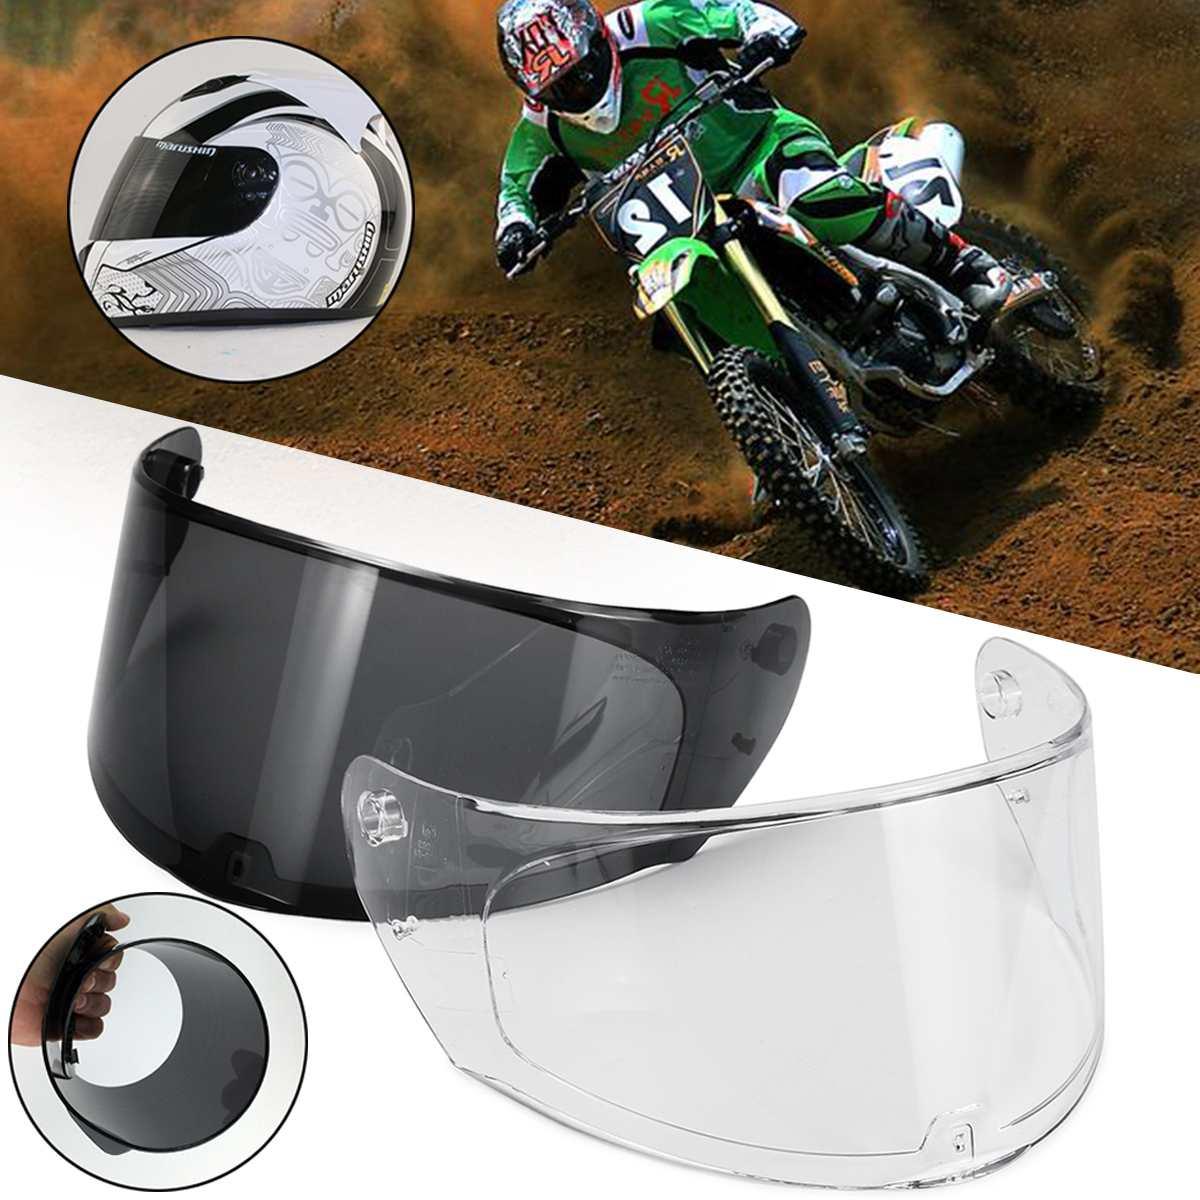 Para ls2 ff320 capacete viseira adequado para ls2 ff320 ff328 ff353 modelo transparente fumaça capacete lente